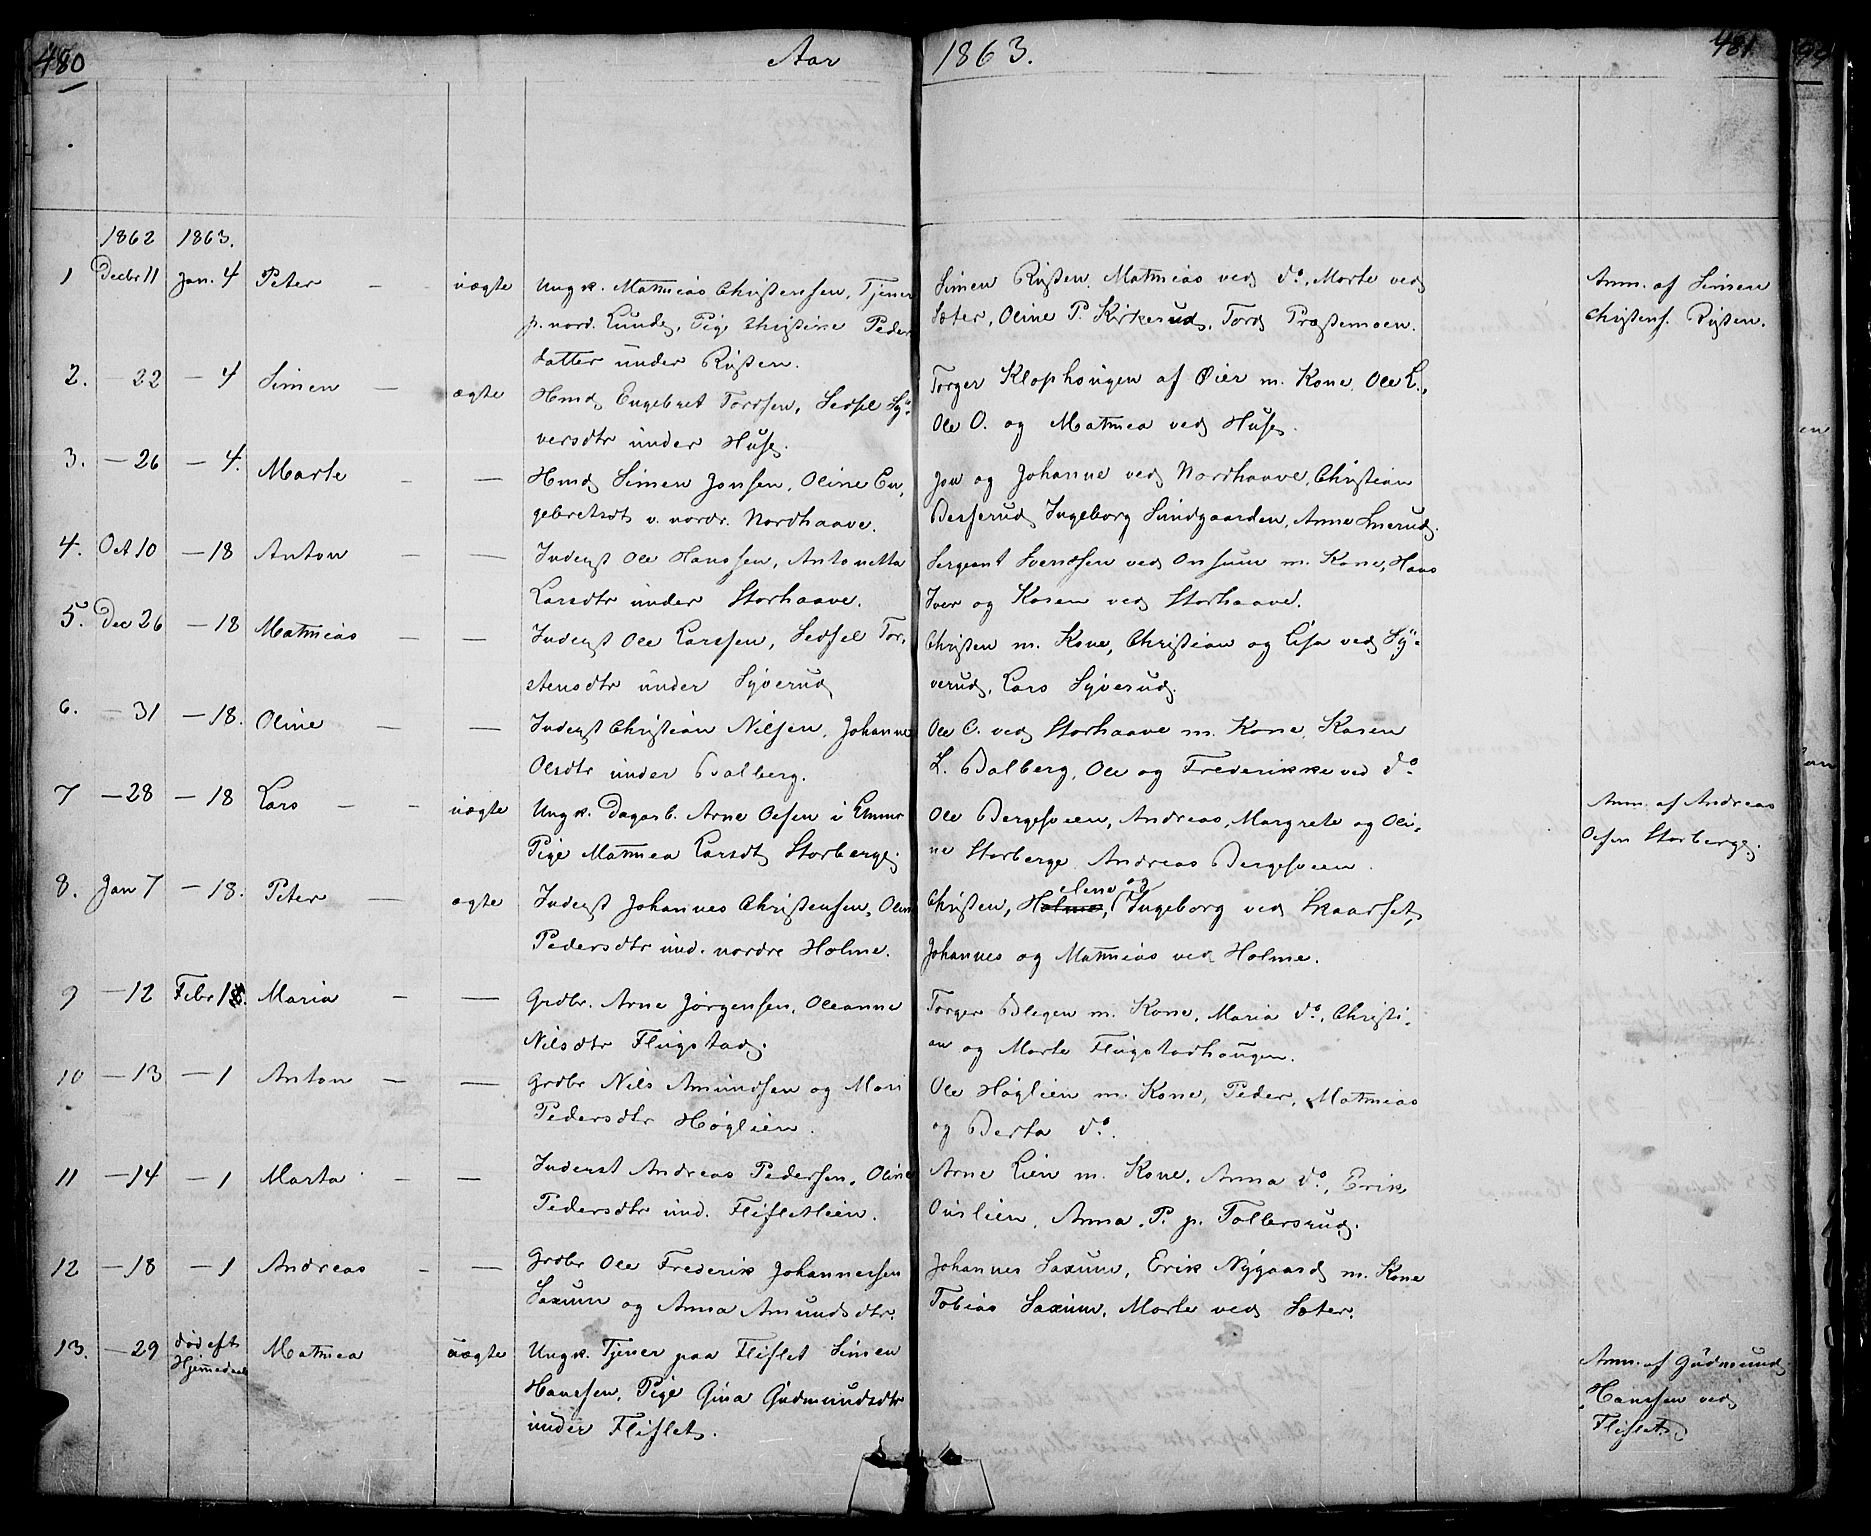 SAH, Fåberg prestekontor, Klokkerbok nr. 5, 1837-1864, s. 480-481